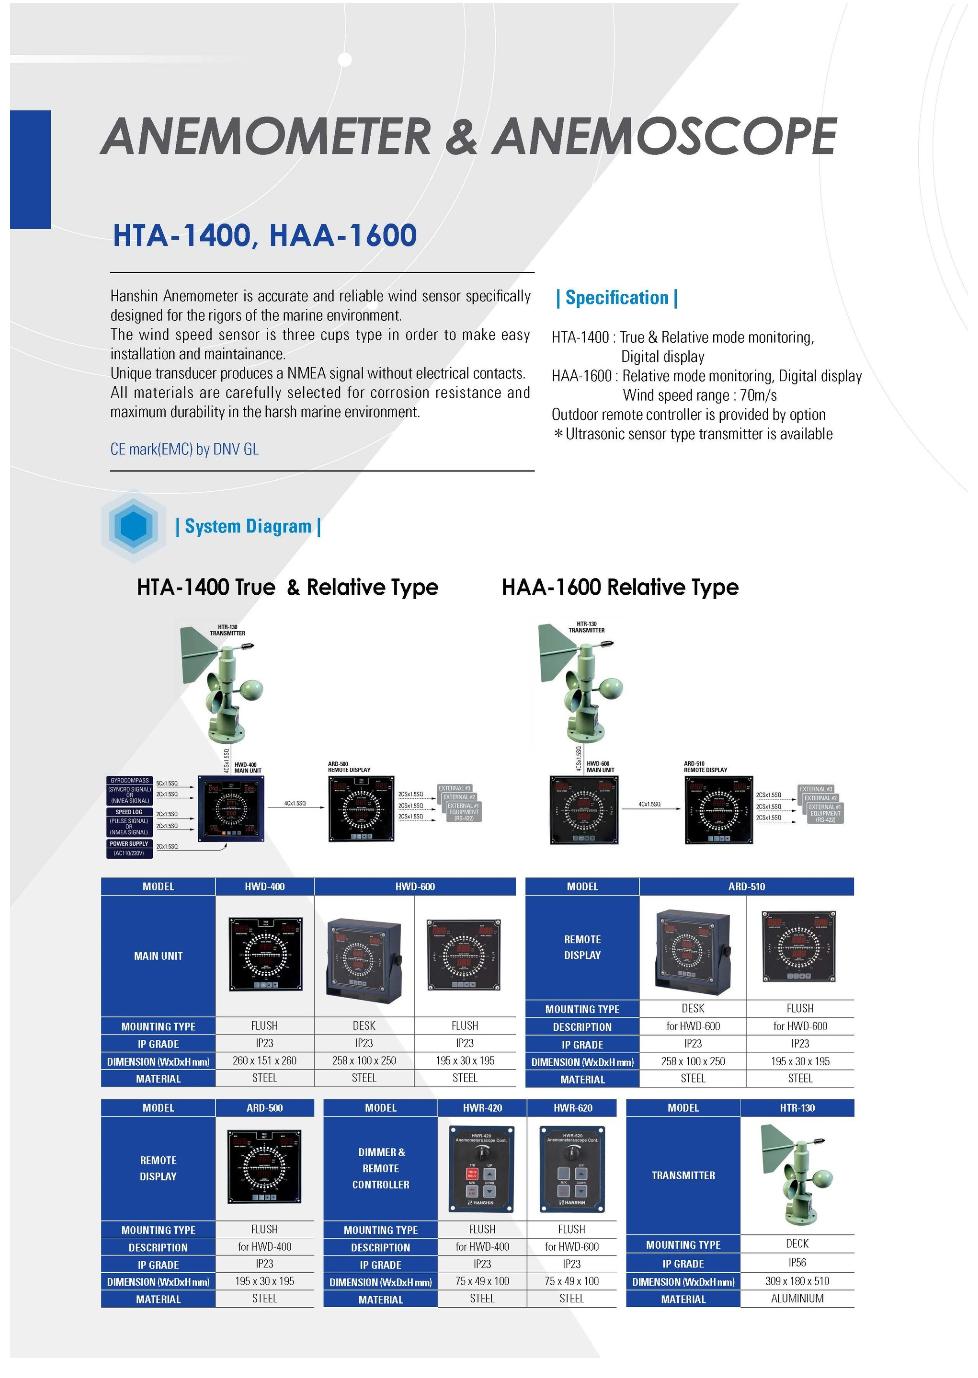 Hanshin Electronics Anemometer & Anemoscope HTA-1400, HAA-1600